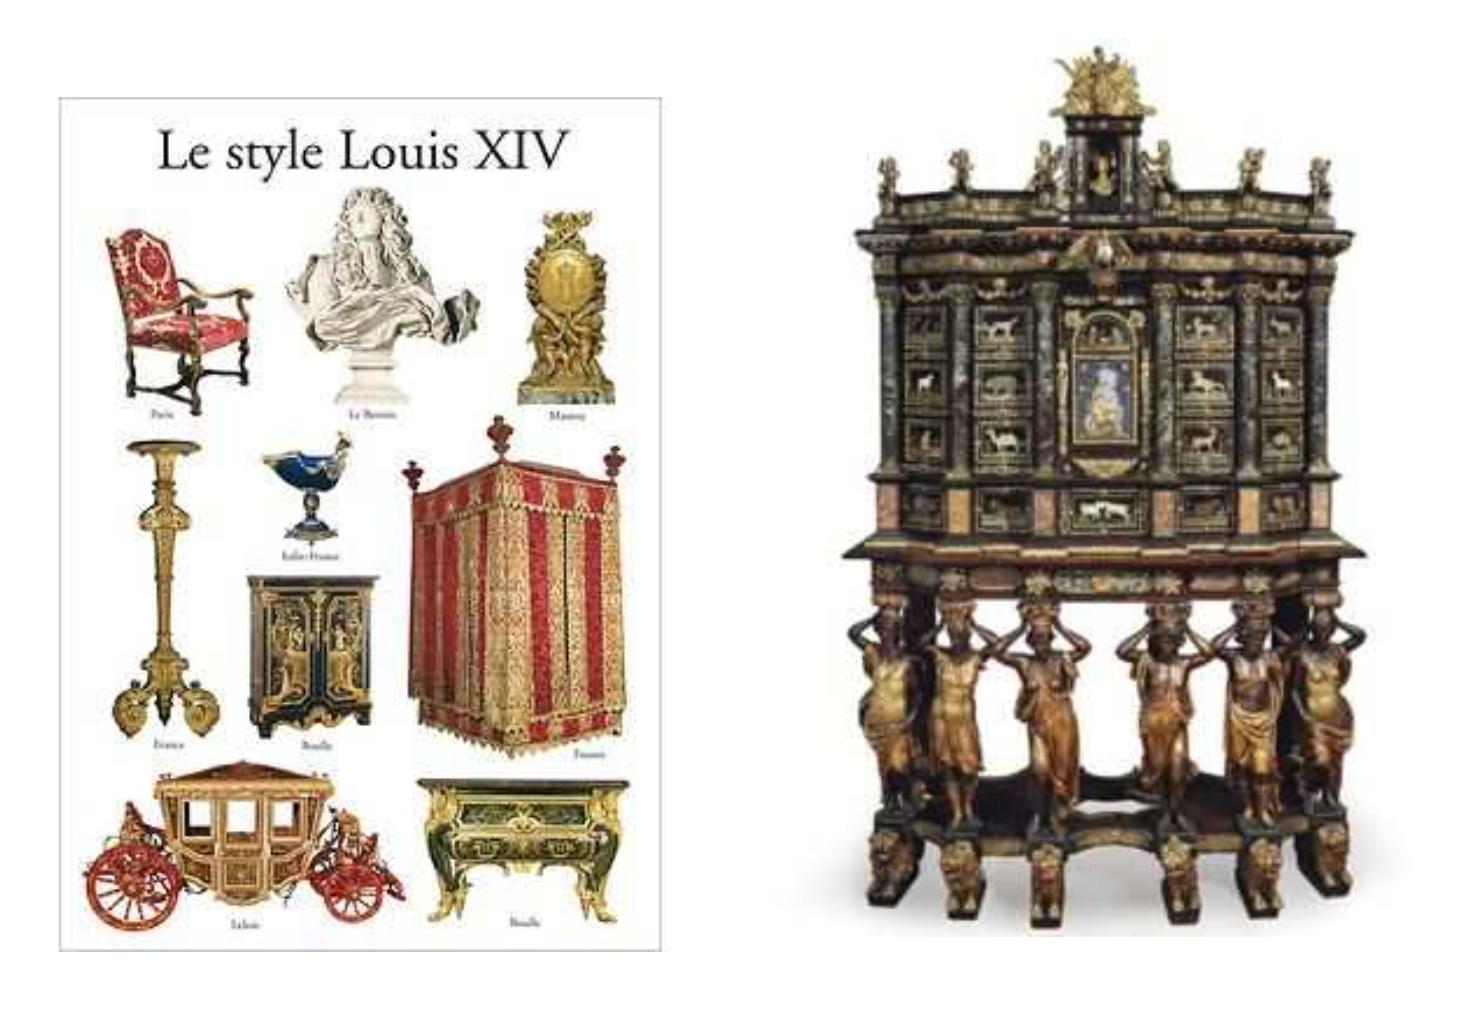 historia del mueble antig edades maestre